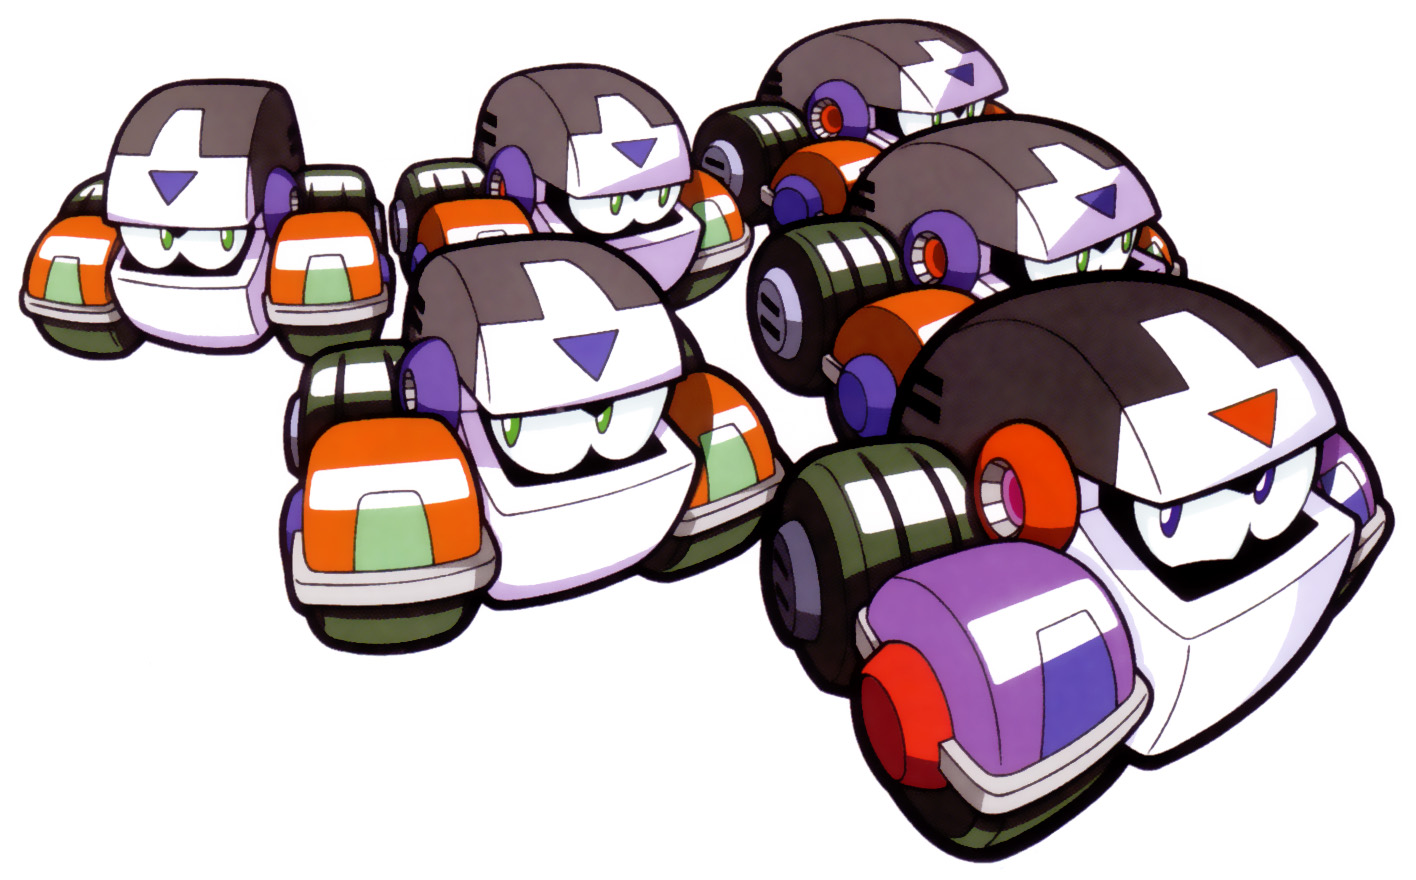 Roader mmkb fandom powered by wikia - Megaman wikia ...